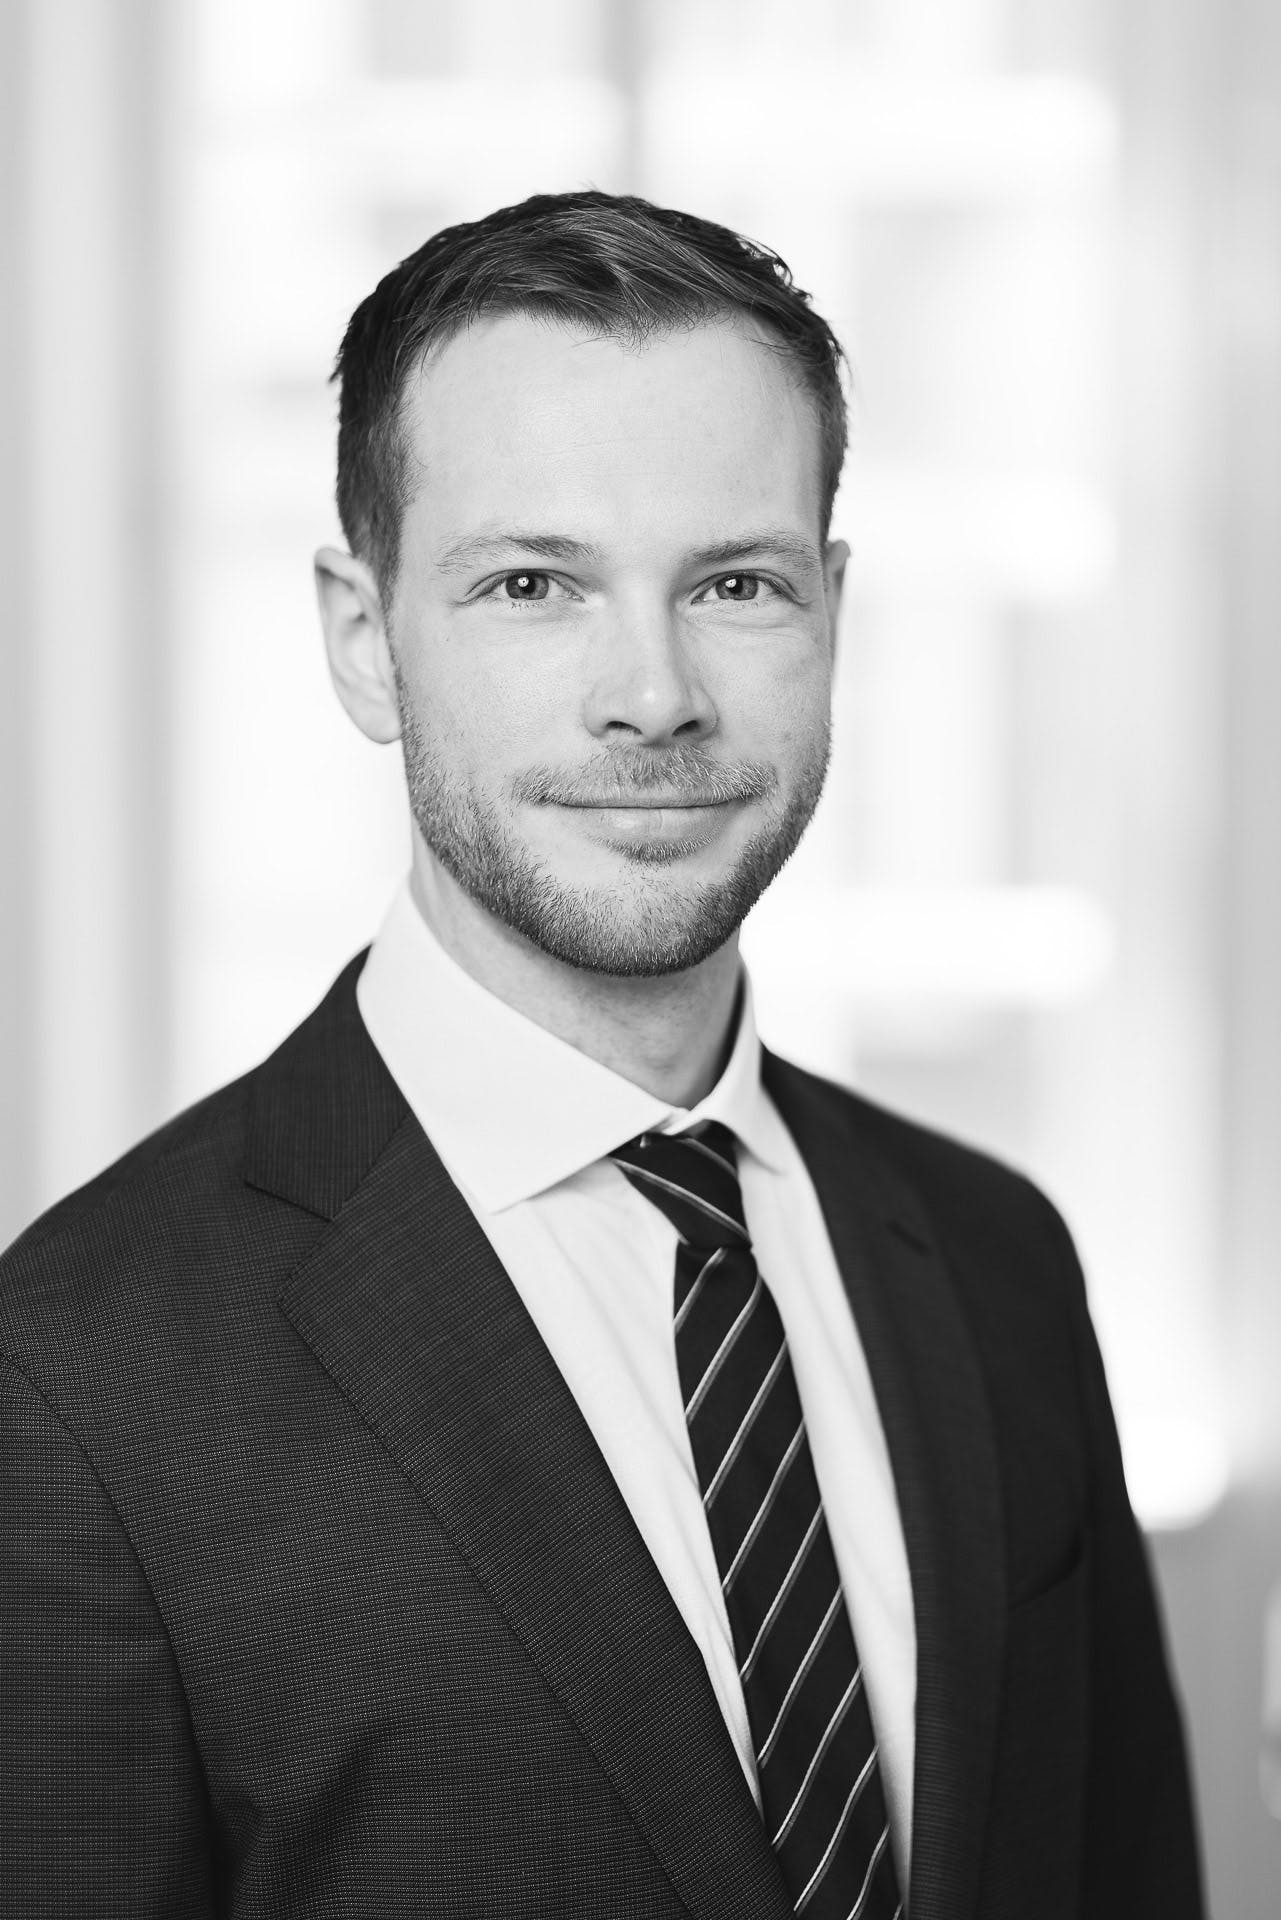 profile image of Hafsteinn Hauksson